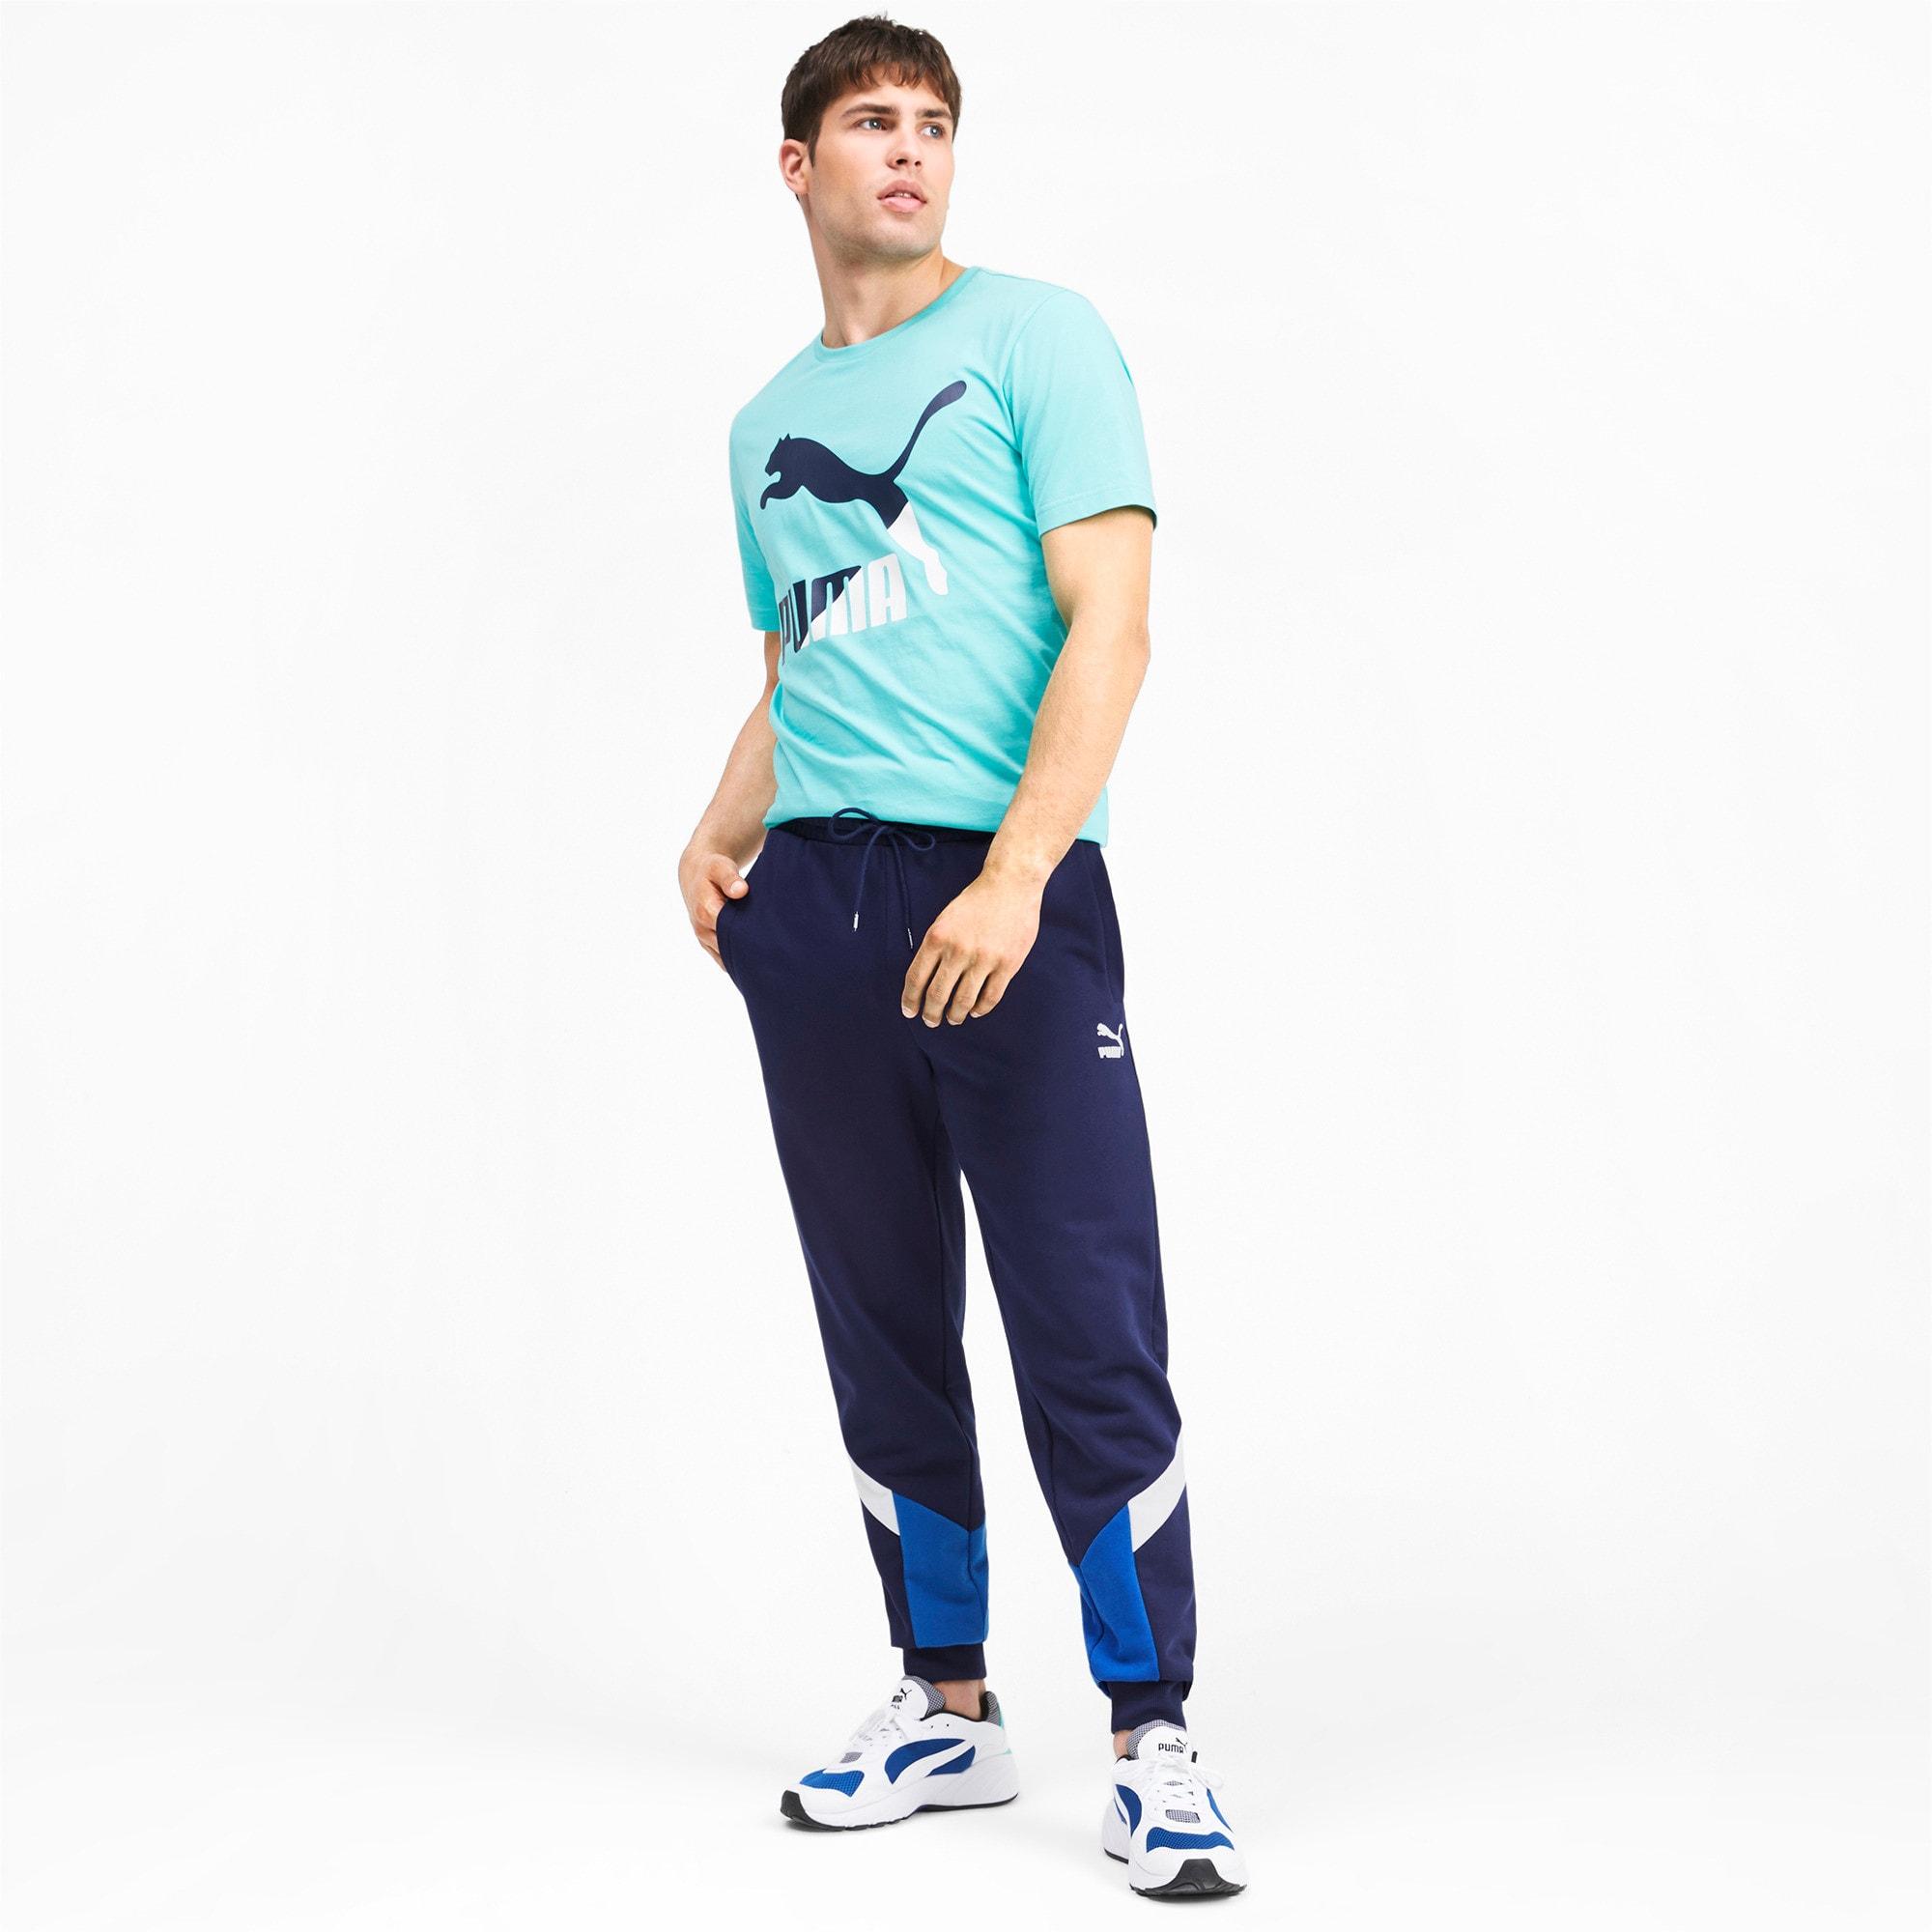 Thumbnail 4 of Iconic MCS Men's Track Pants, Peacoat, medium